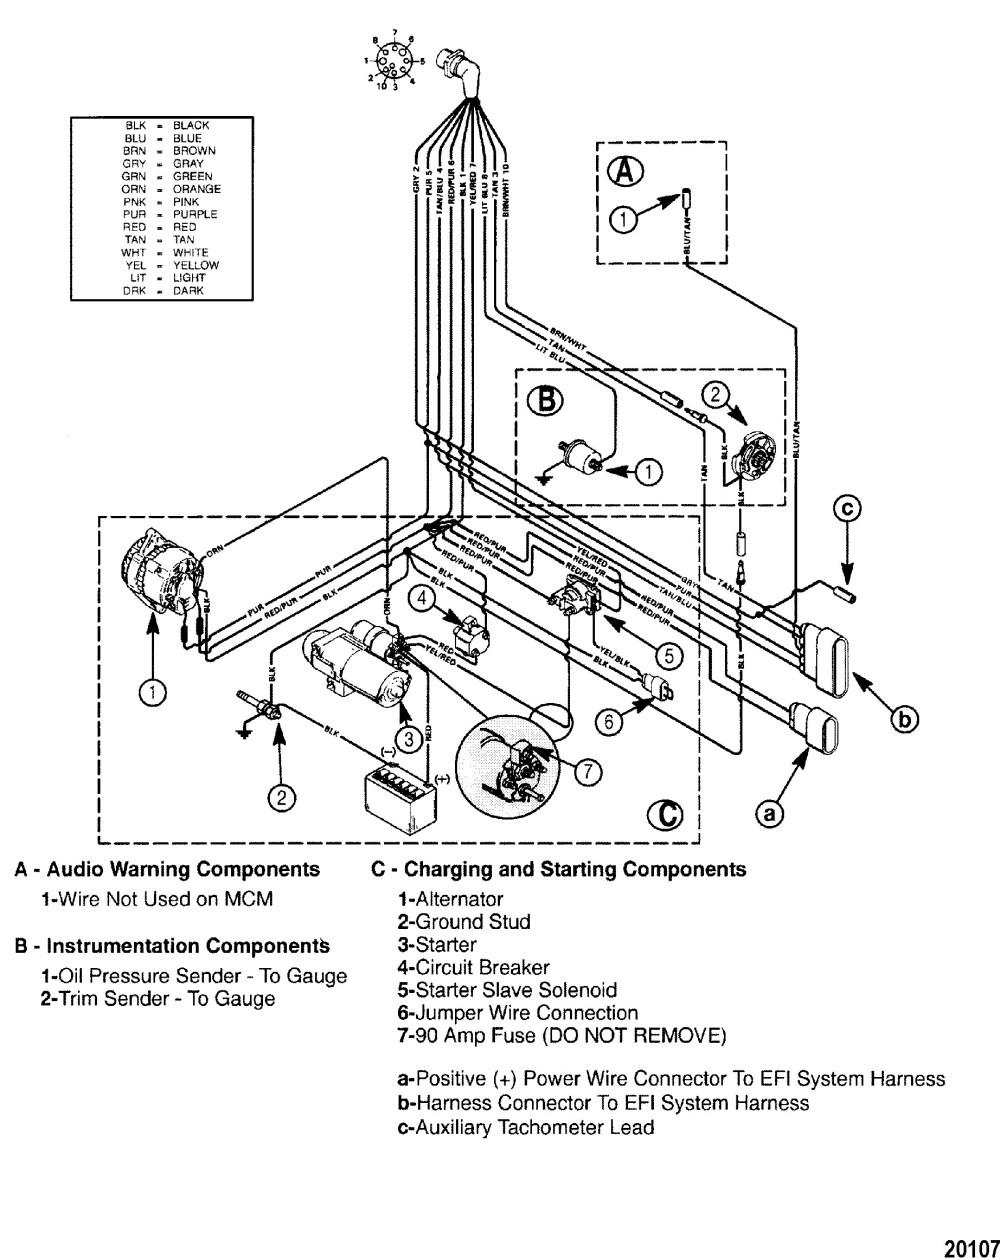 medium resolution of mercruiser 470 engine diagram mercruiser 454 mag mpi horizon gen vi